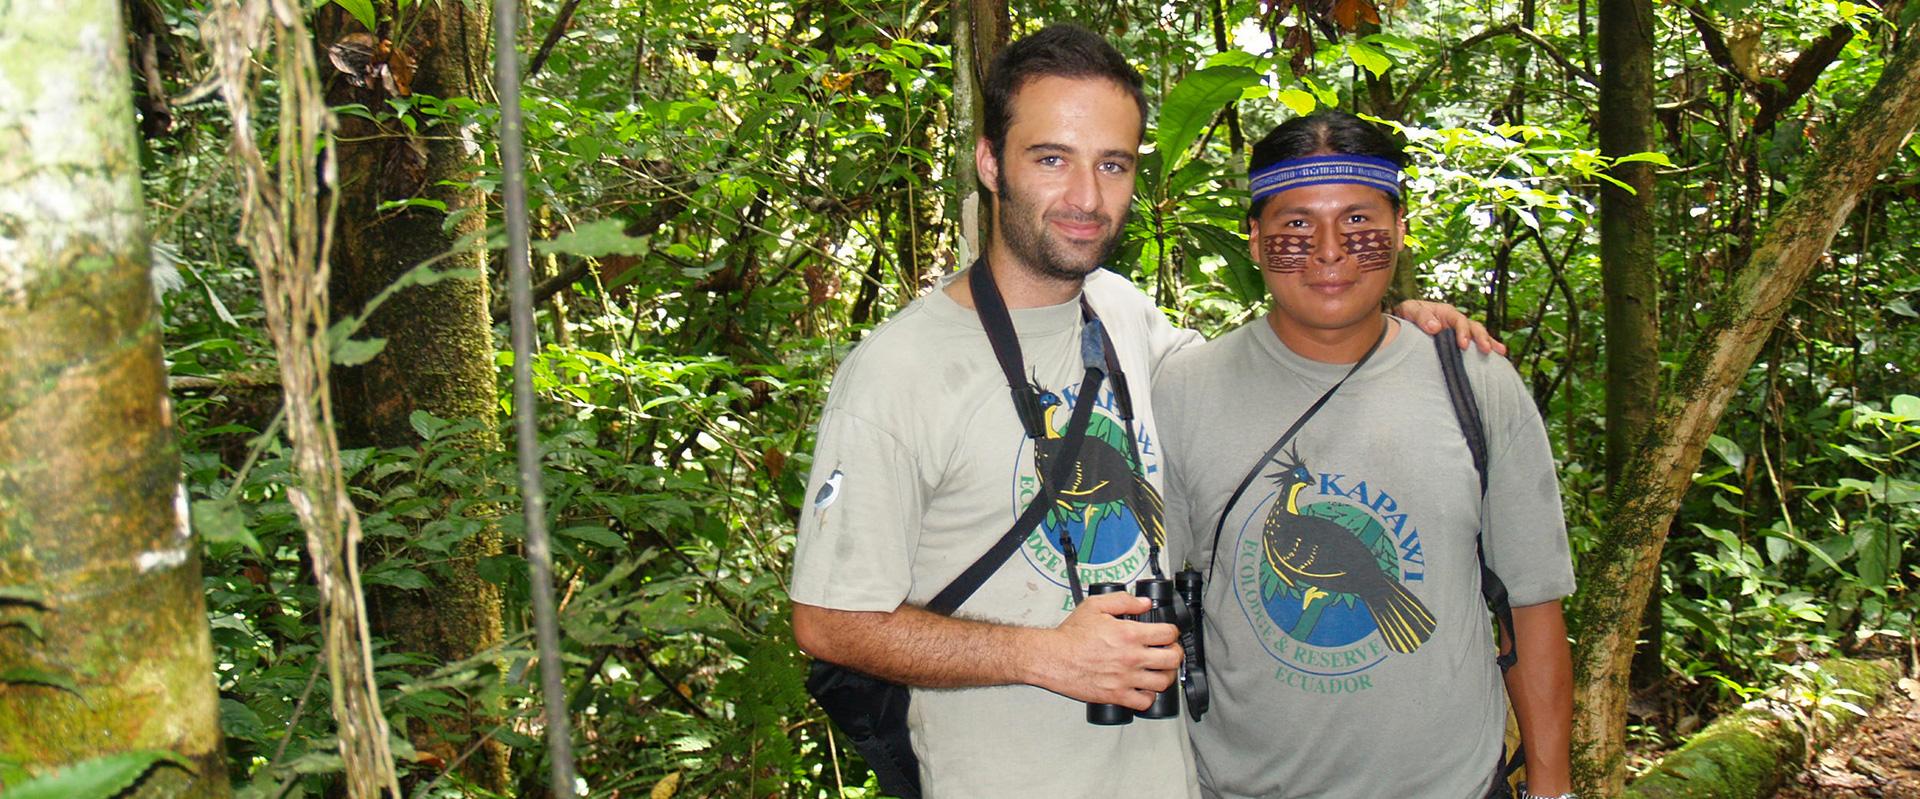 Kapawi Amazon Guides